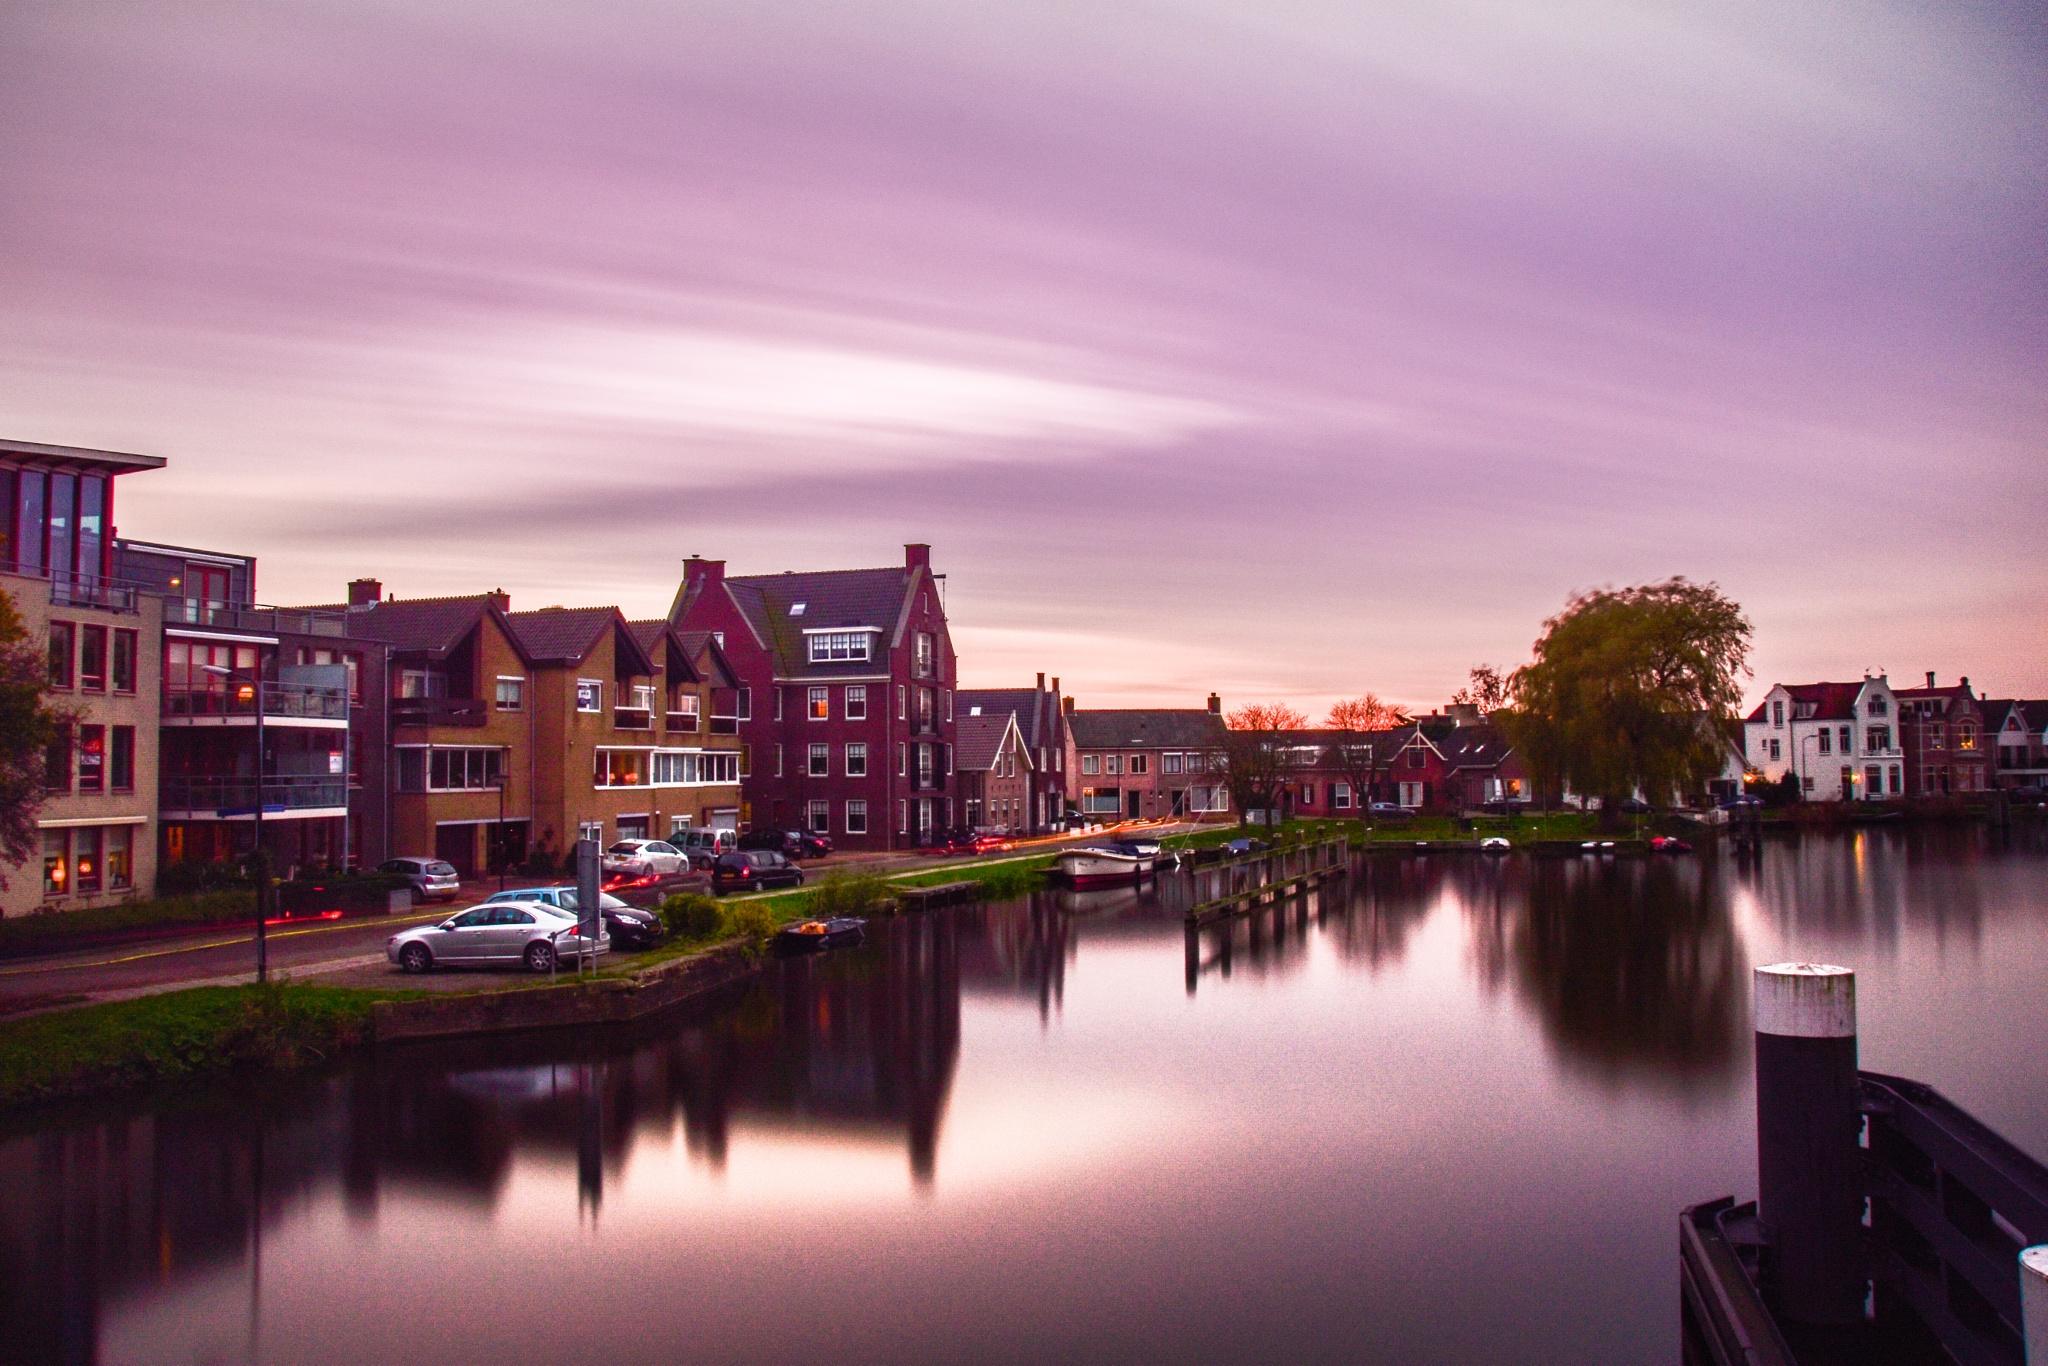 Pittoresque Uithoorn by San Zijlstra